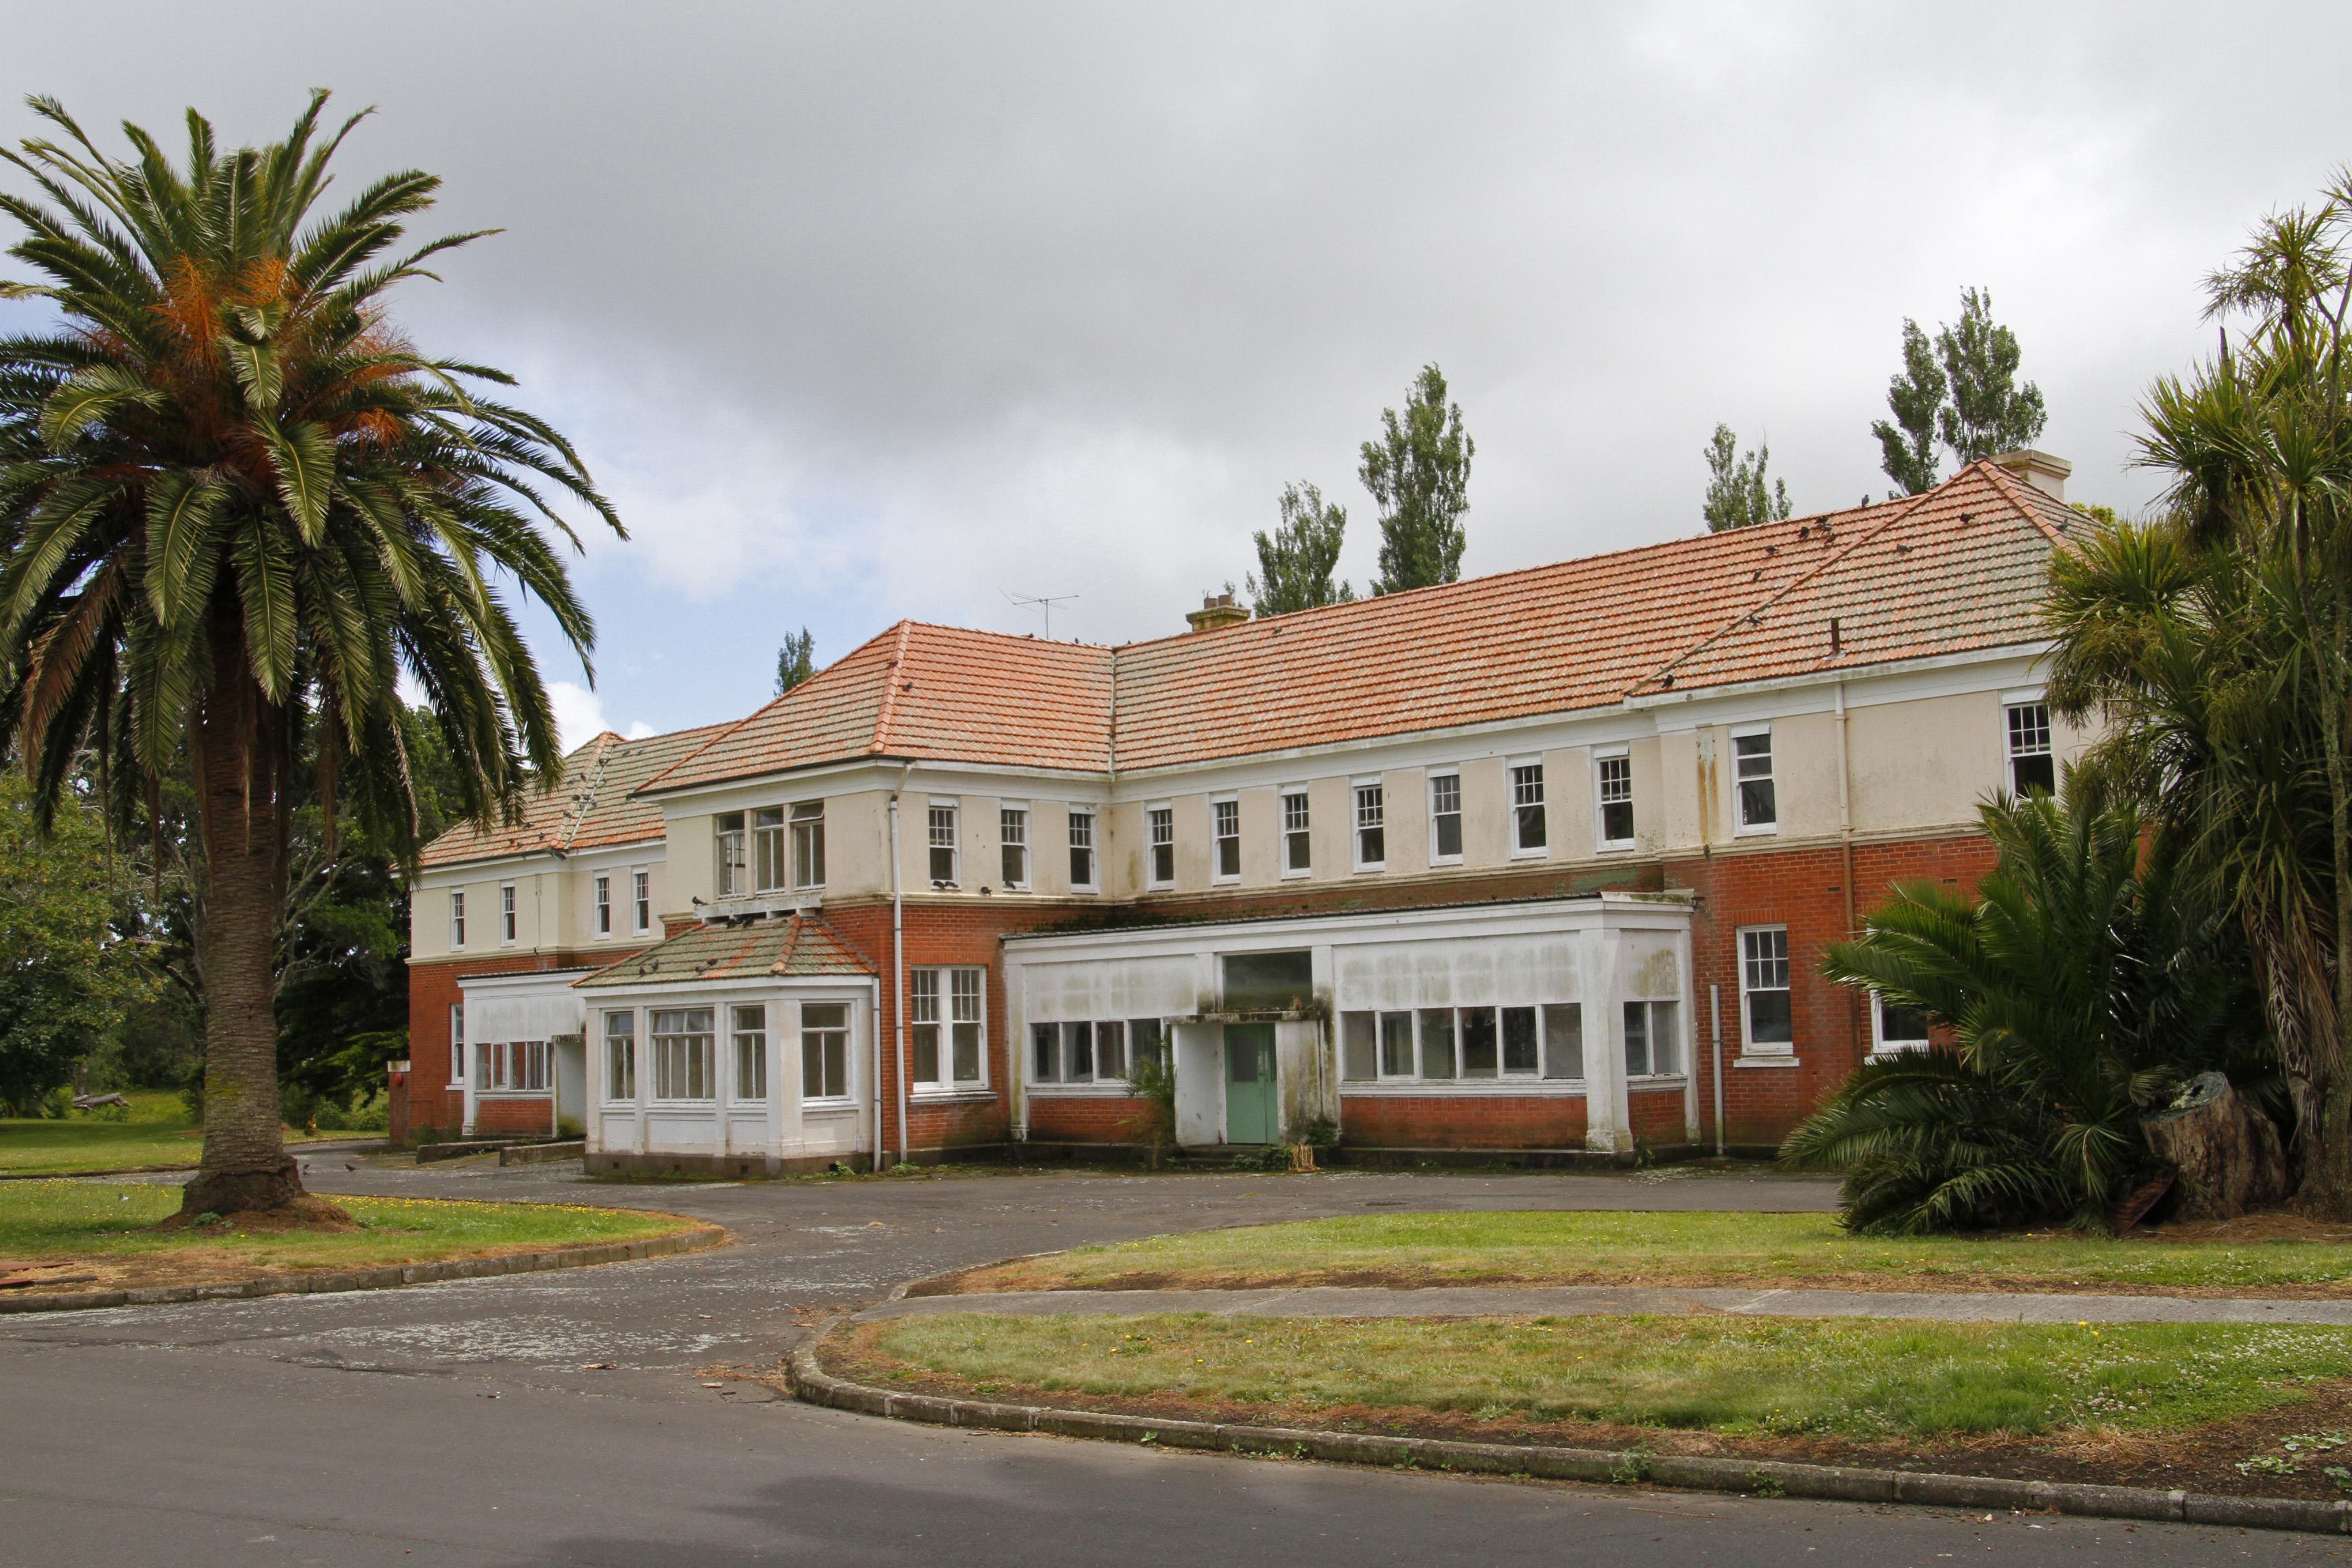 Kingseat Hospital